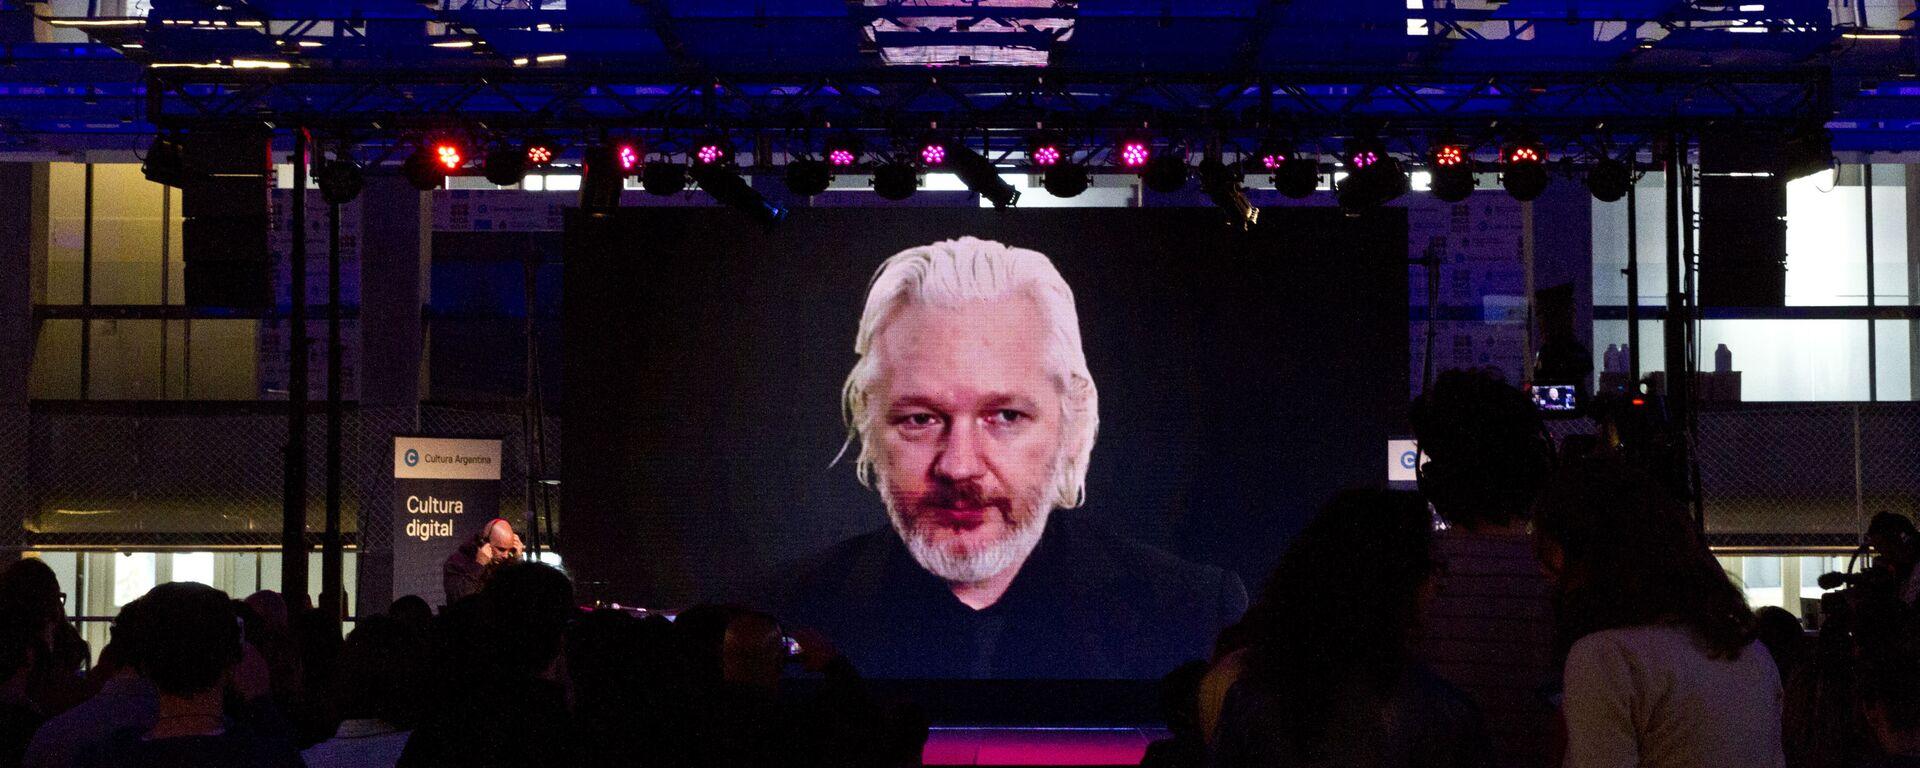 Julian Assange durante una vídeoconferencia - Sputnik Mundo, 1920, 30.04.2021